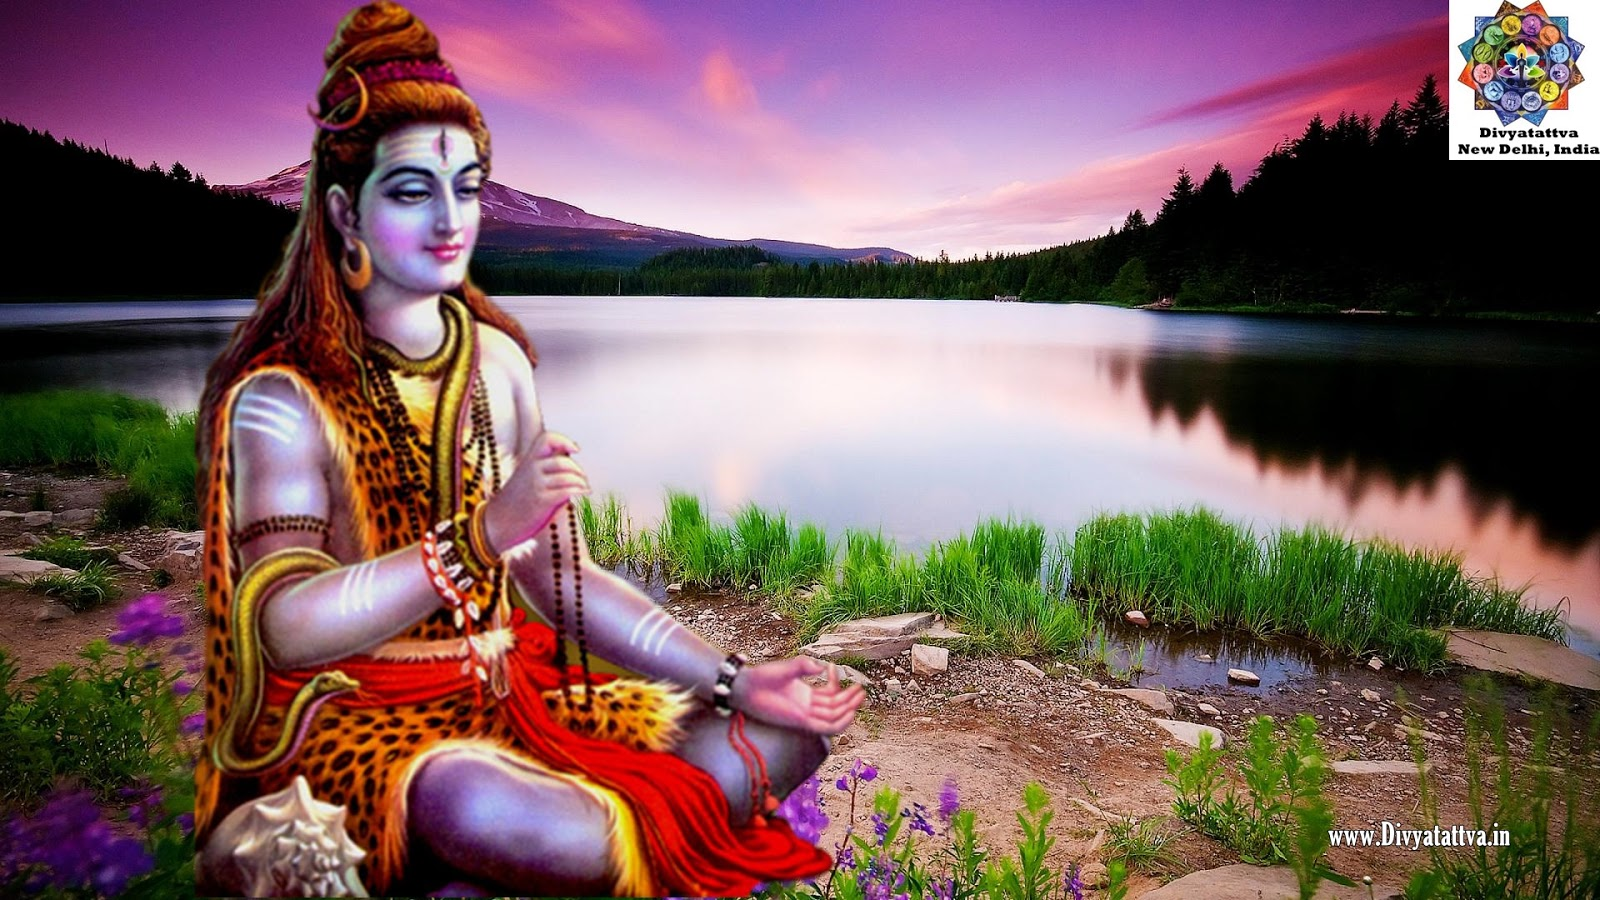 Shiva Lord Wallpapers Desktop Hd Wallpapers: Divyatattva Astrology Free Horoscopes Psychic Tarot Yoga